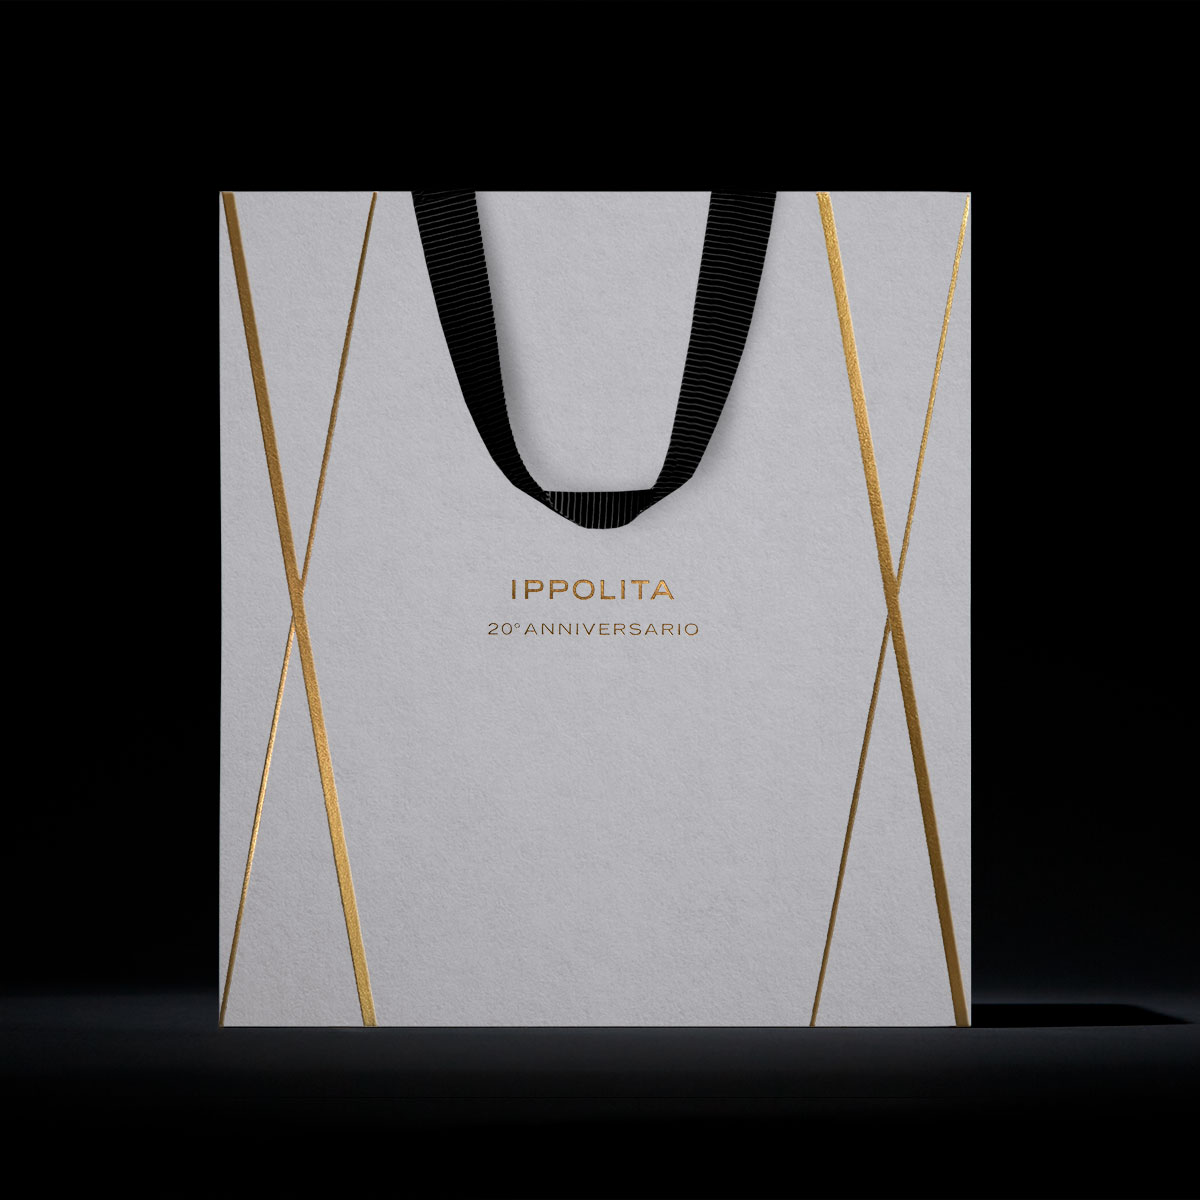 Ippolita shopping bag